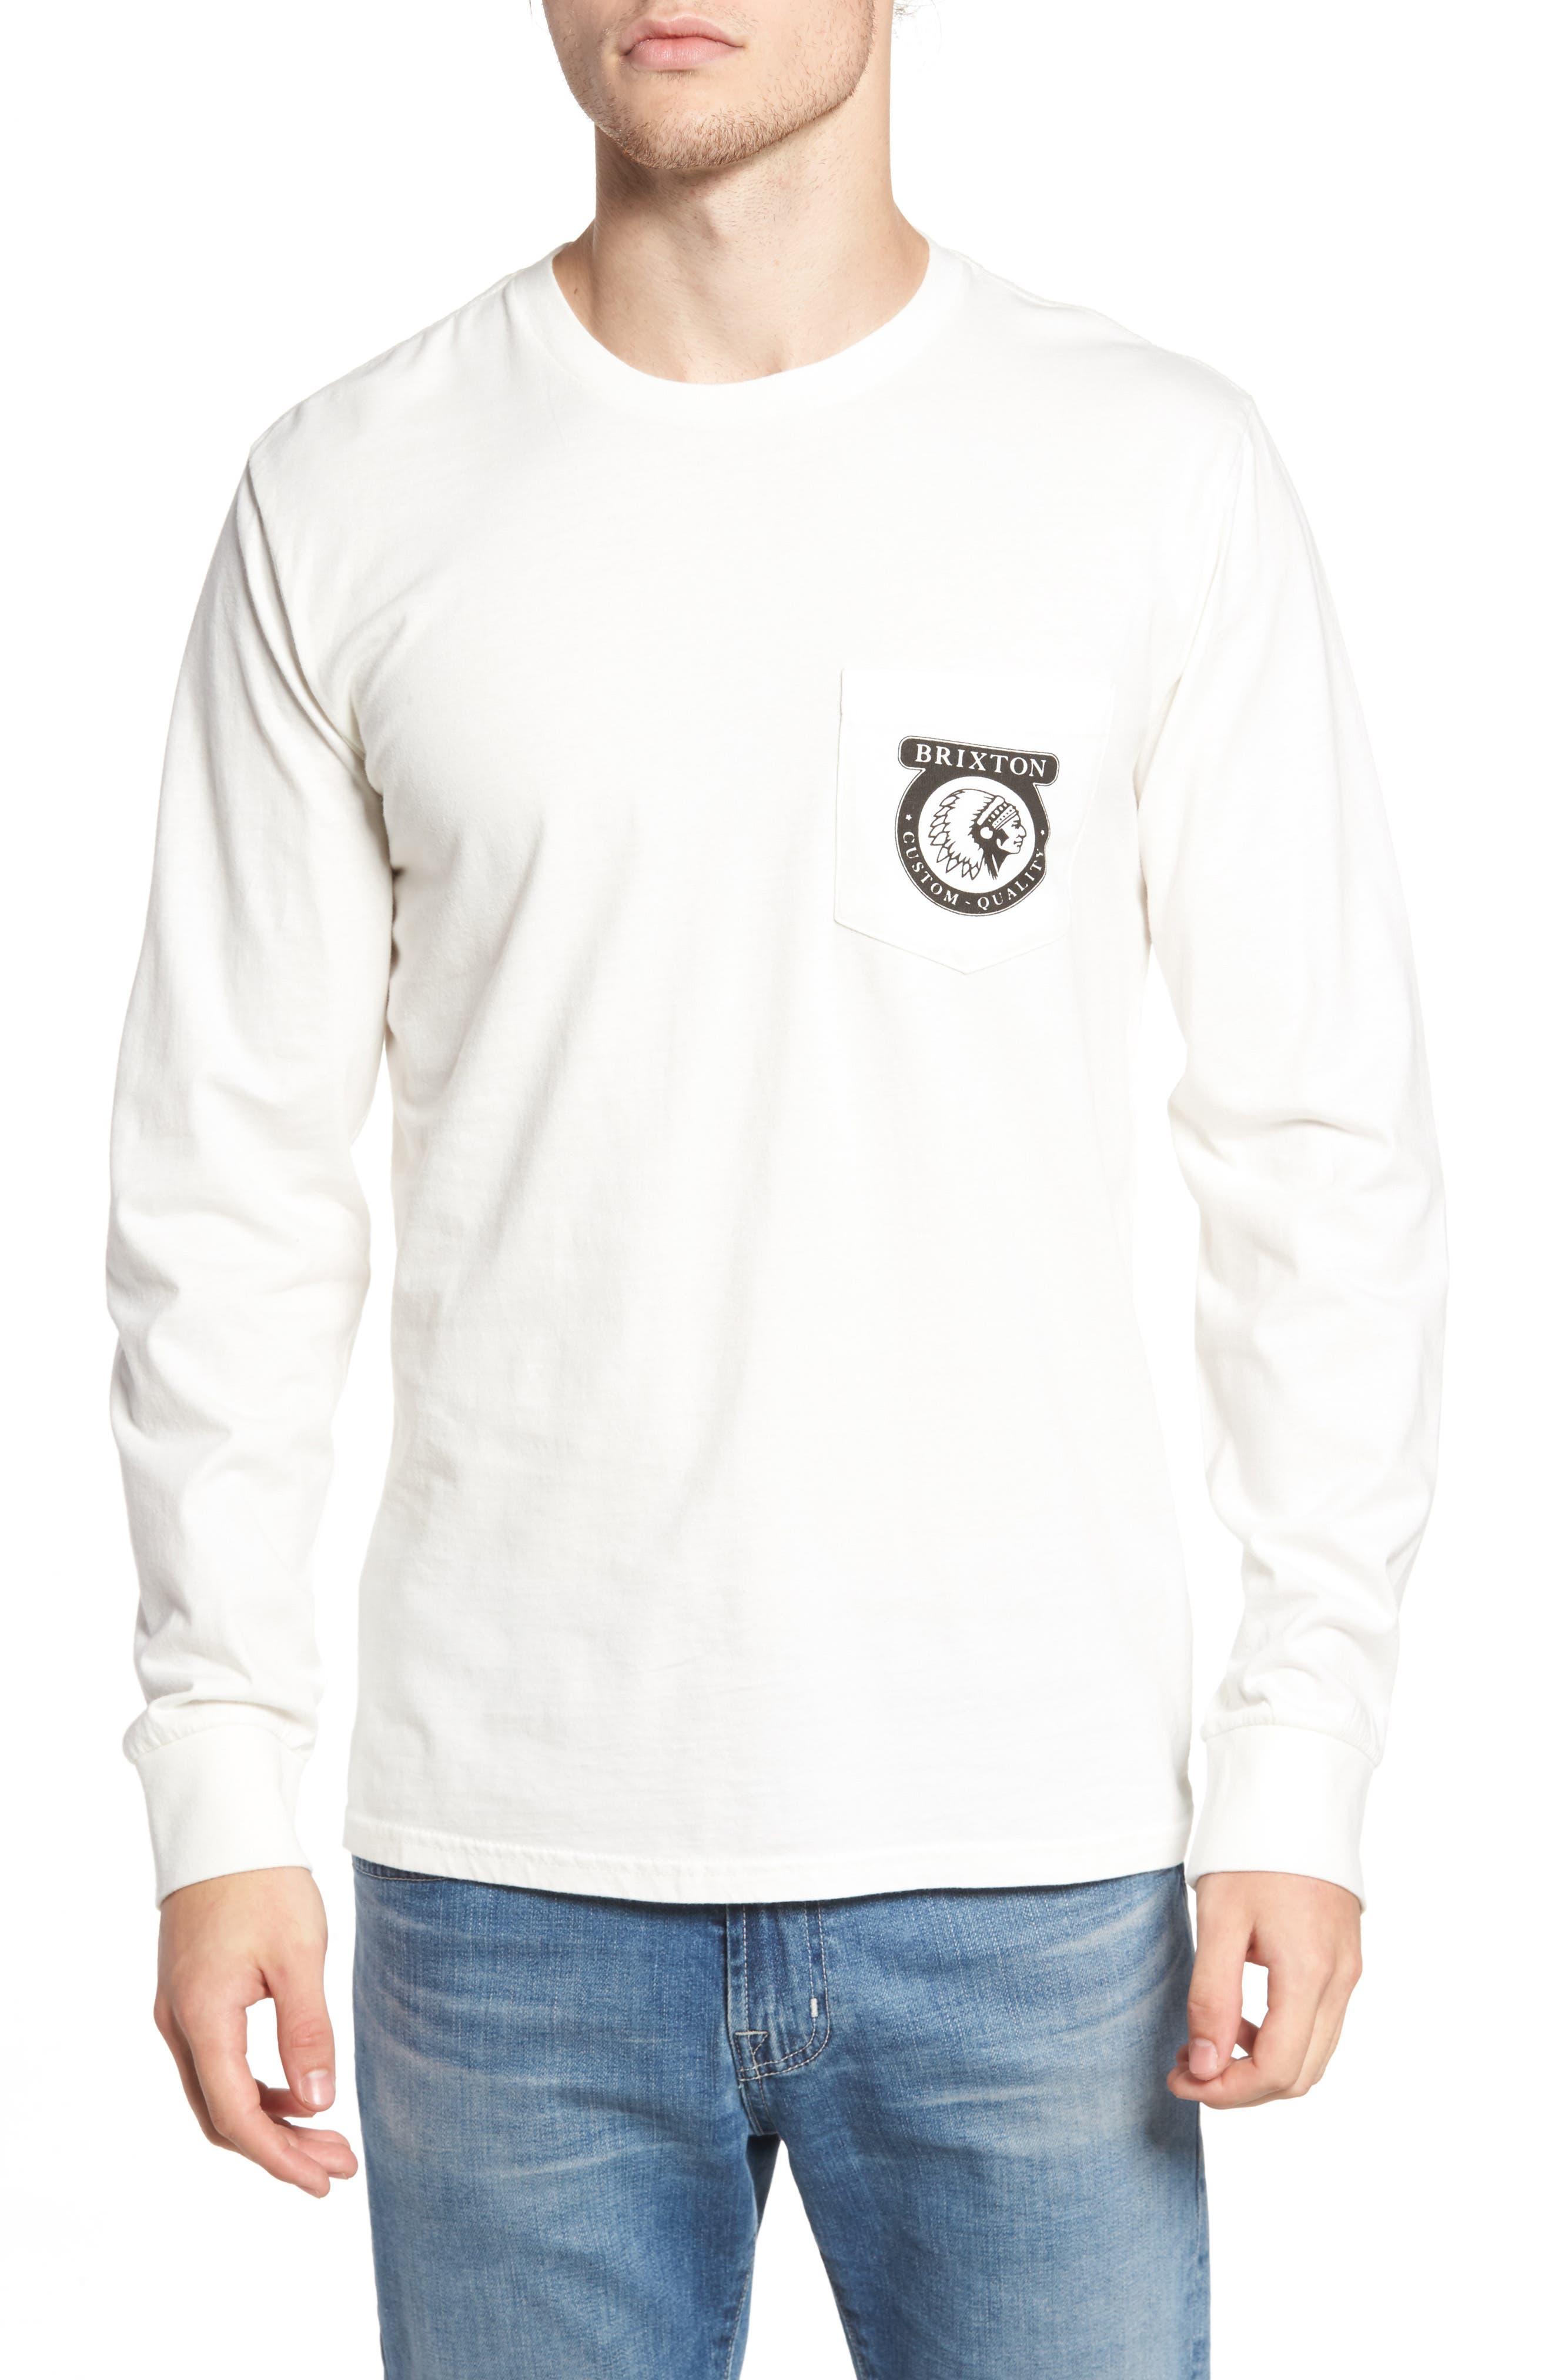 Brixton Pocket T-Shirt